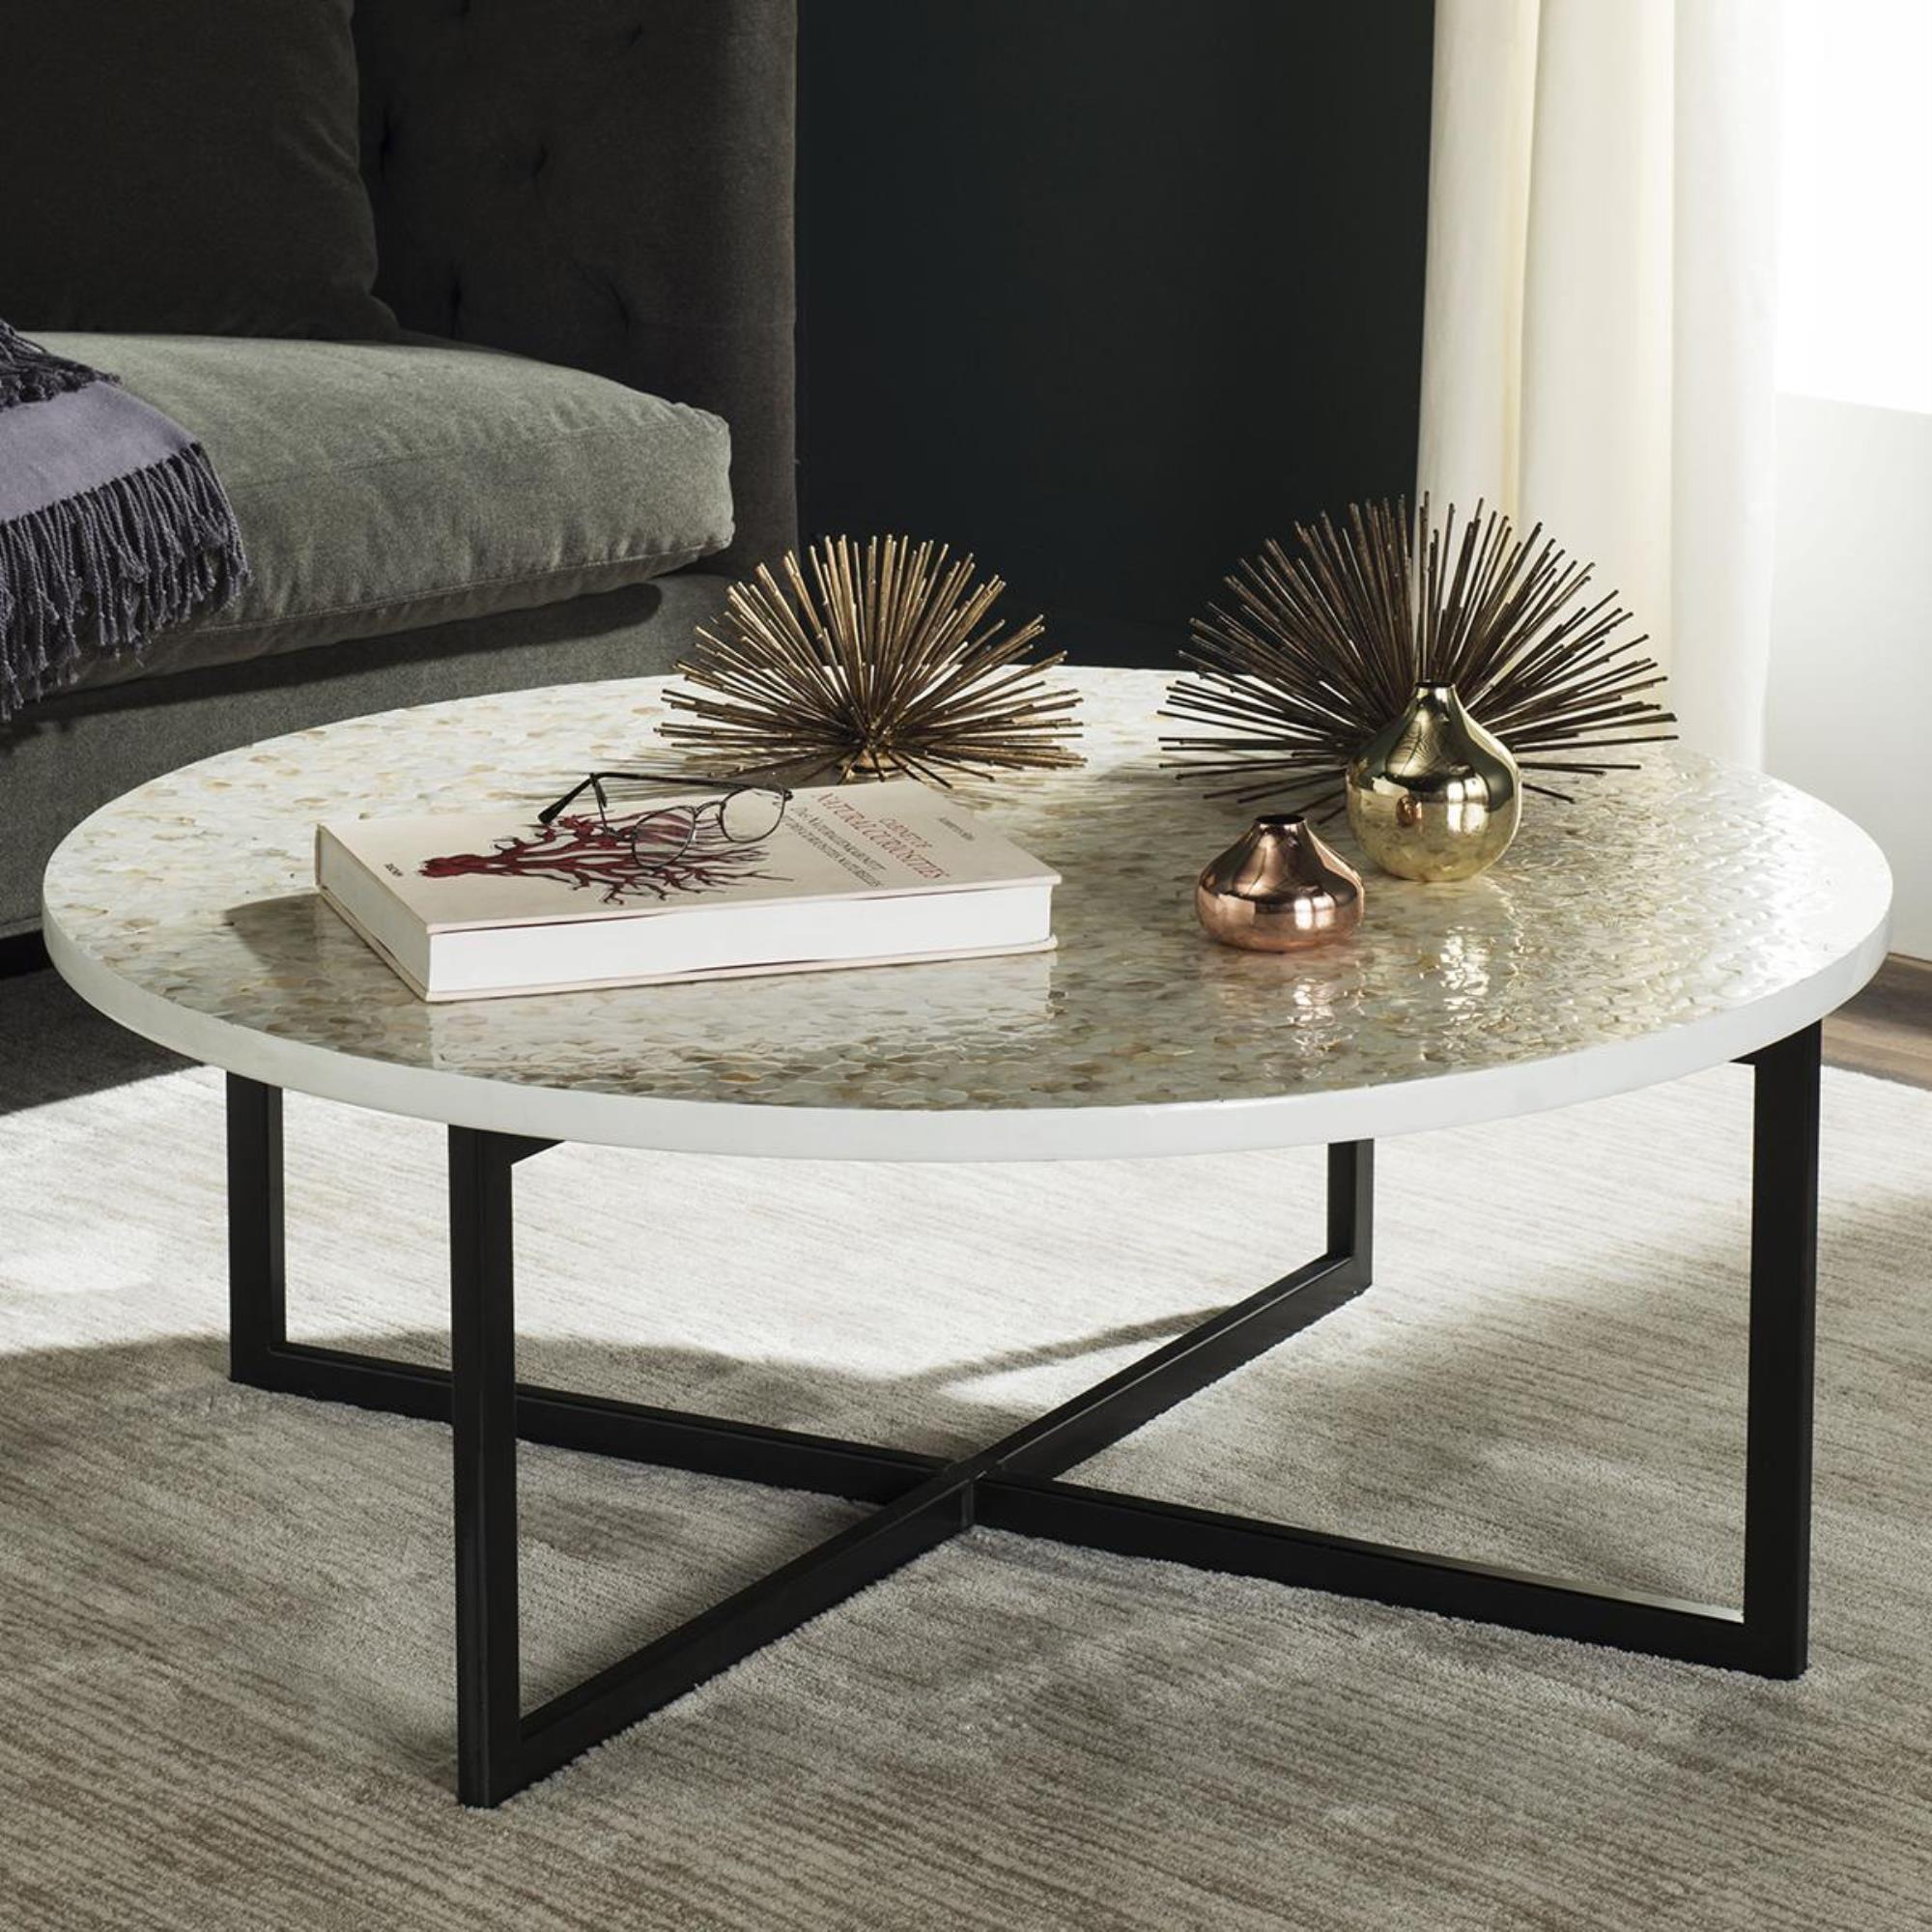 Safavieh Cheyenne Coffee Table In Cream Nfm Coffee Table Coffee Table White Living Room Decor [ 2000 x 2000 Pixel ]